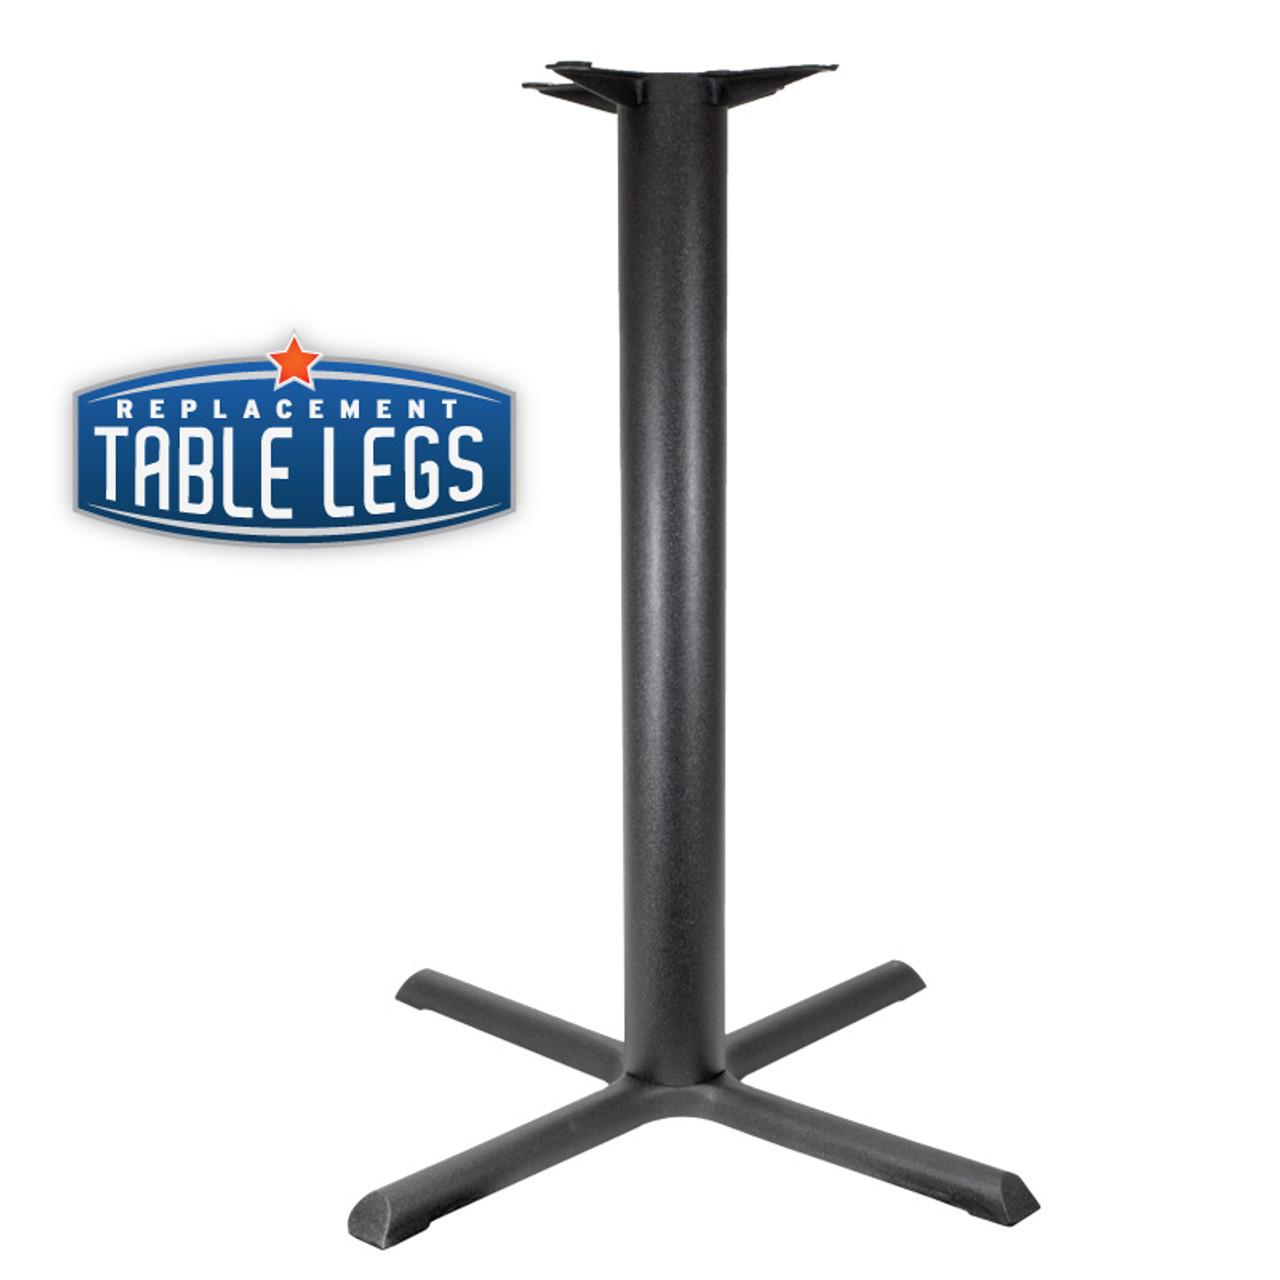 "CAST IRON TABLE BASE, X Style 36""x36"", 40-1/4"" height, 4"" diameter steel column - replacementtablelegs.com"